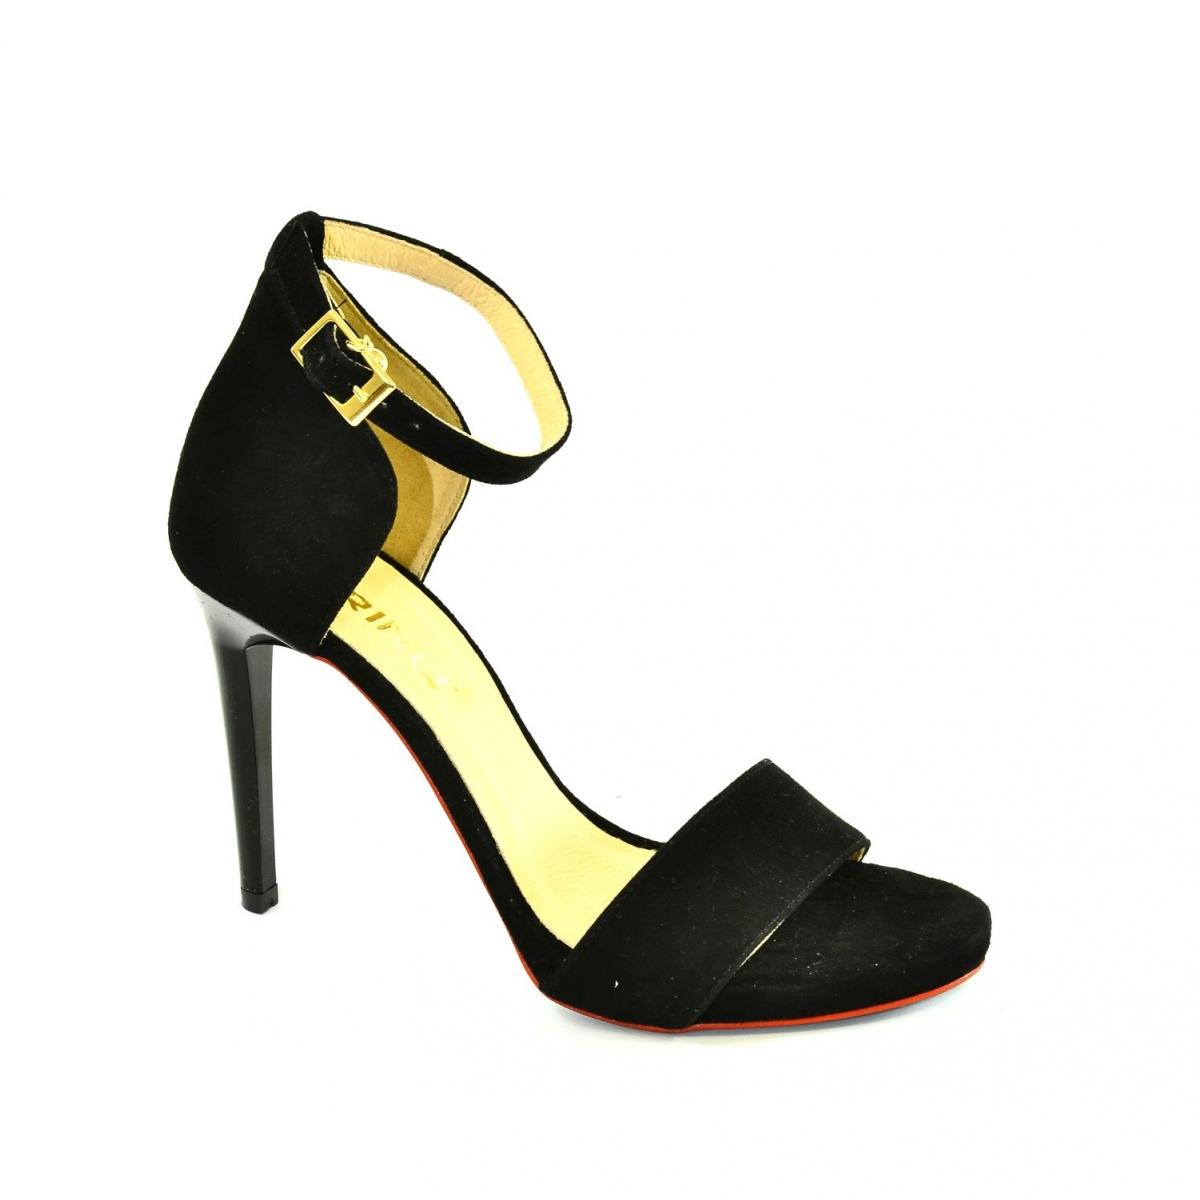 93c366c4c9e36 Dámske čierne sandále MIRELLA - 5